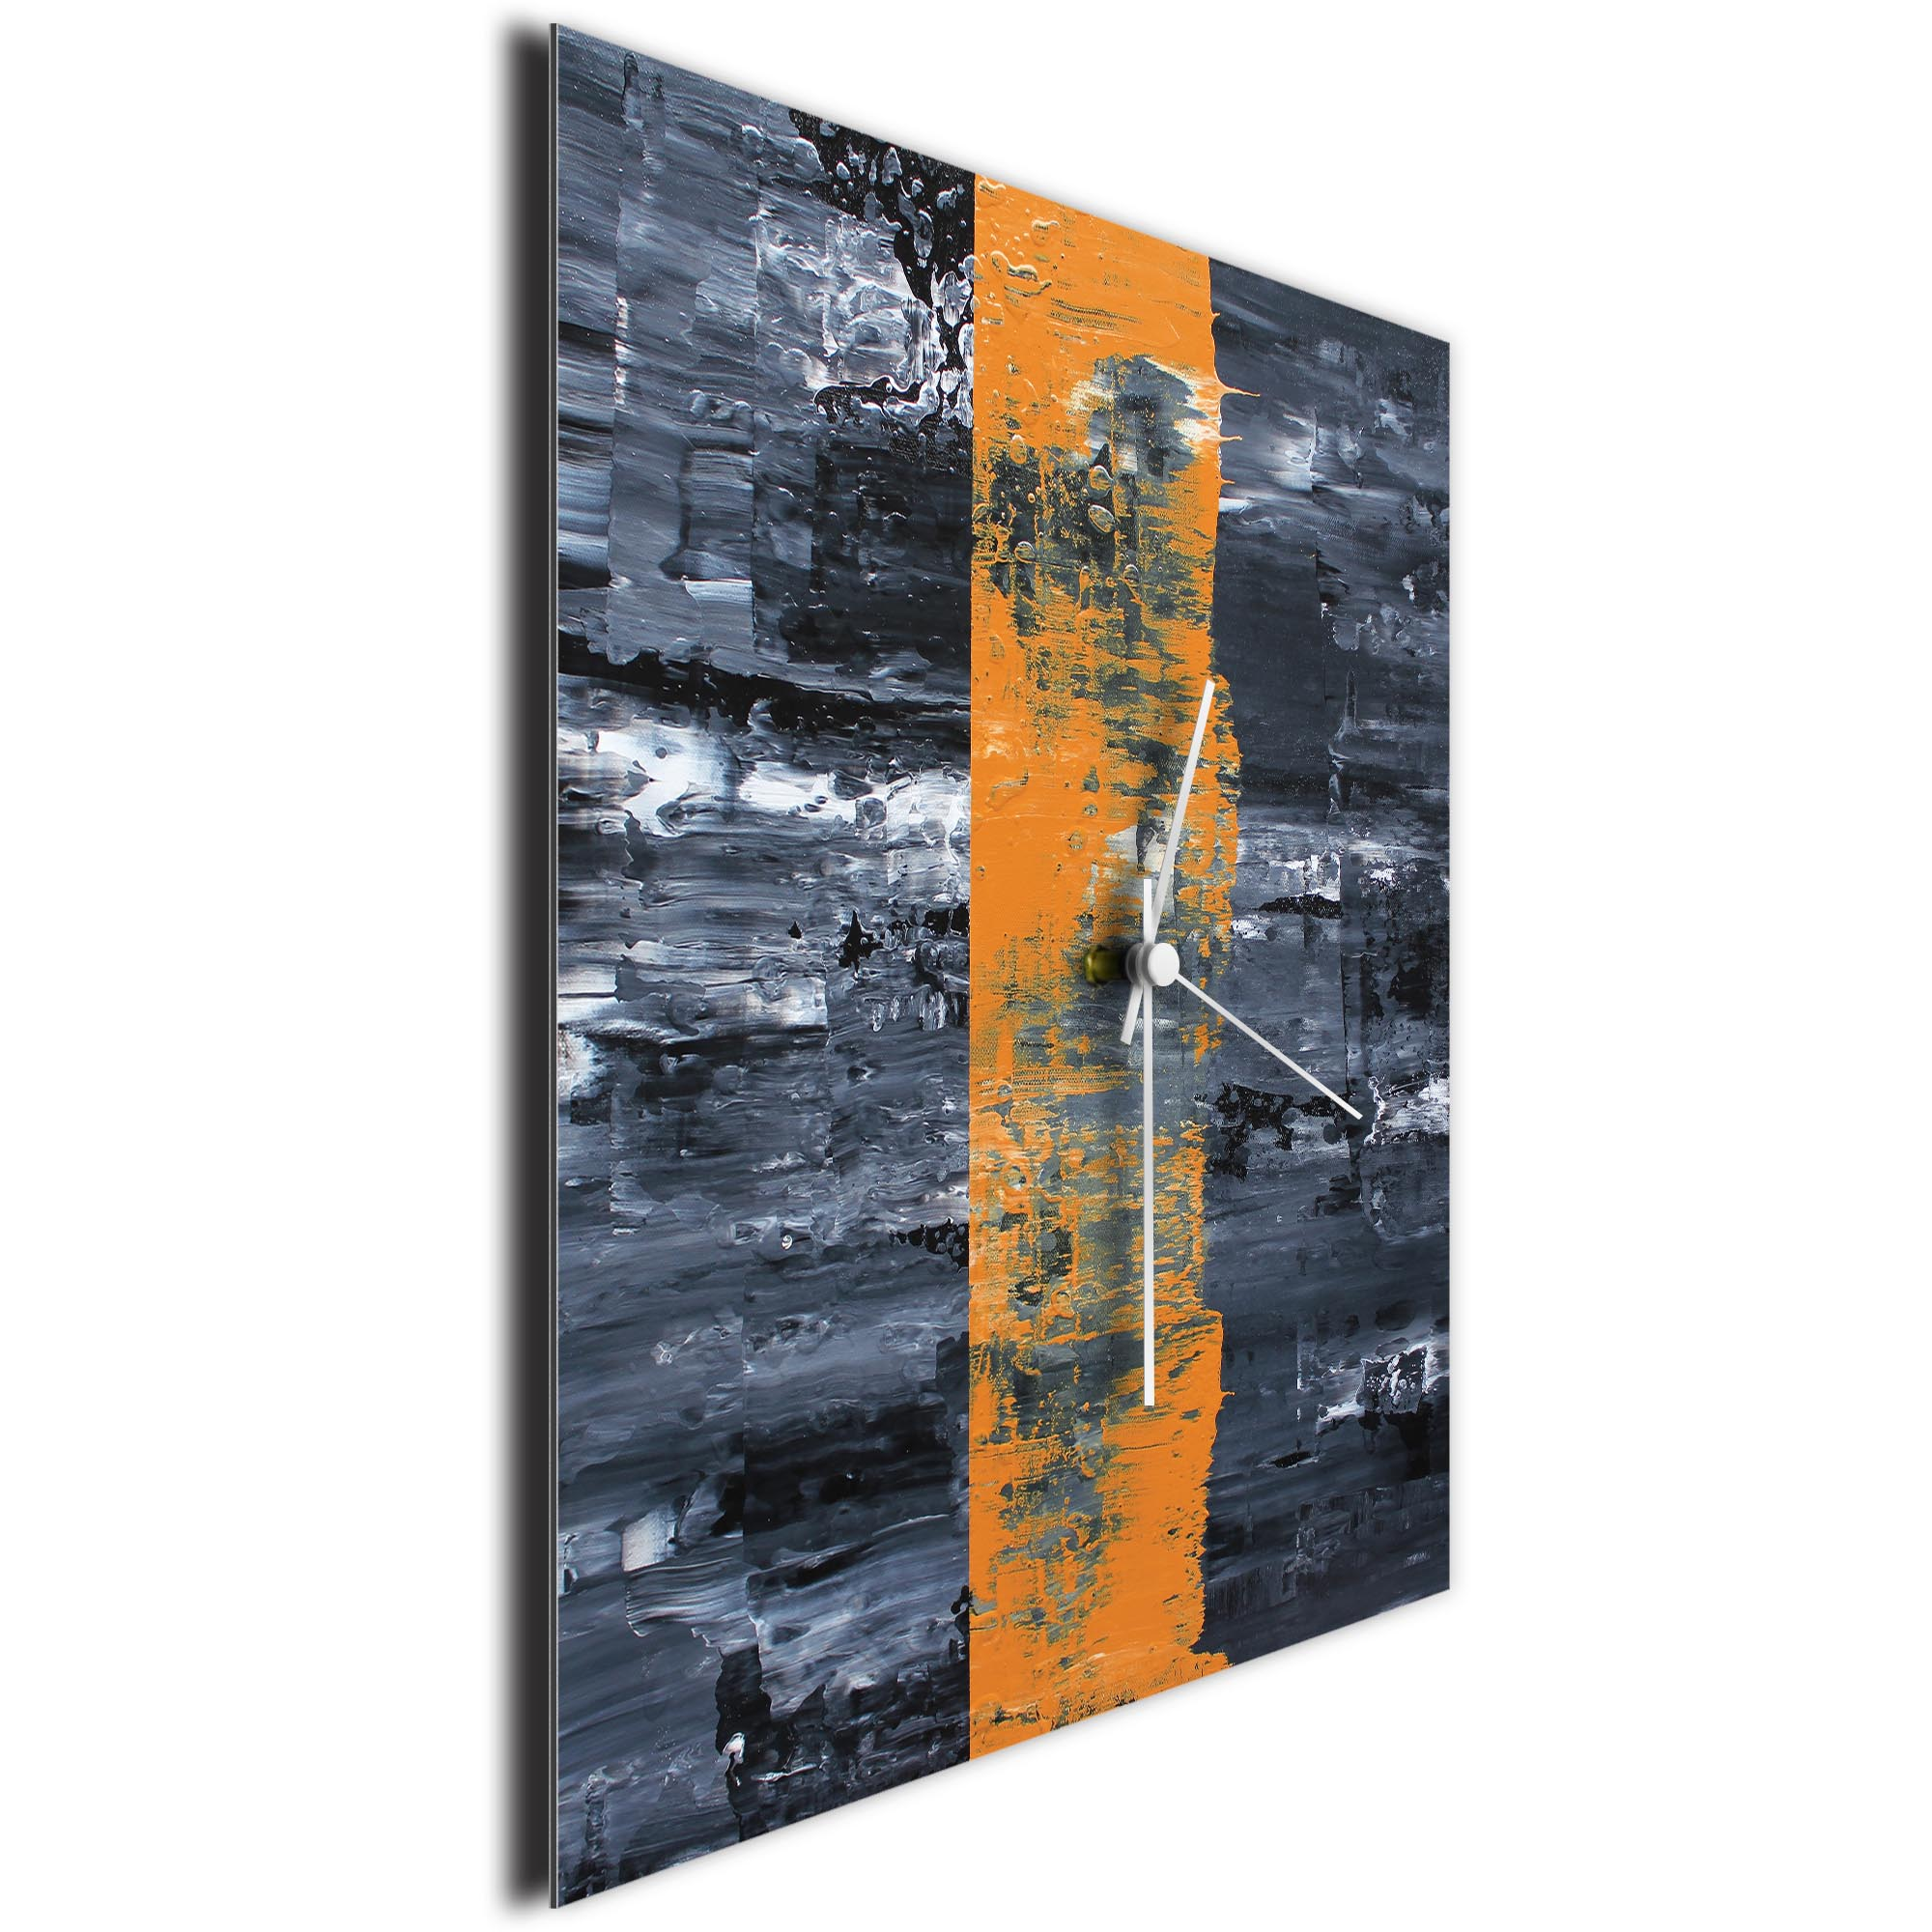 Orange Line Square Clock by Mendo Vasilevski - Urban Abstract Home Decor - Image 3